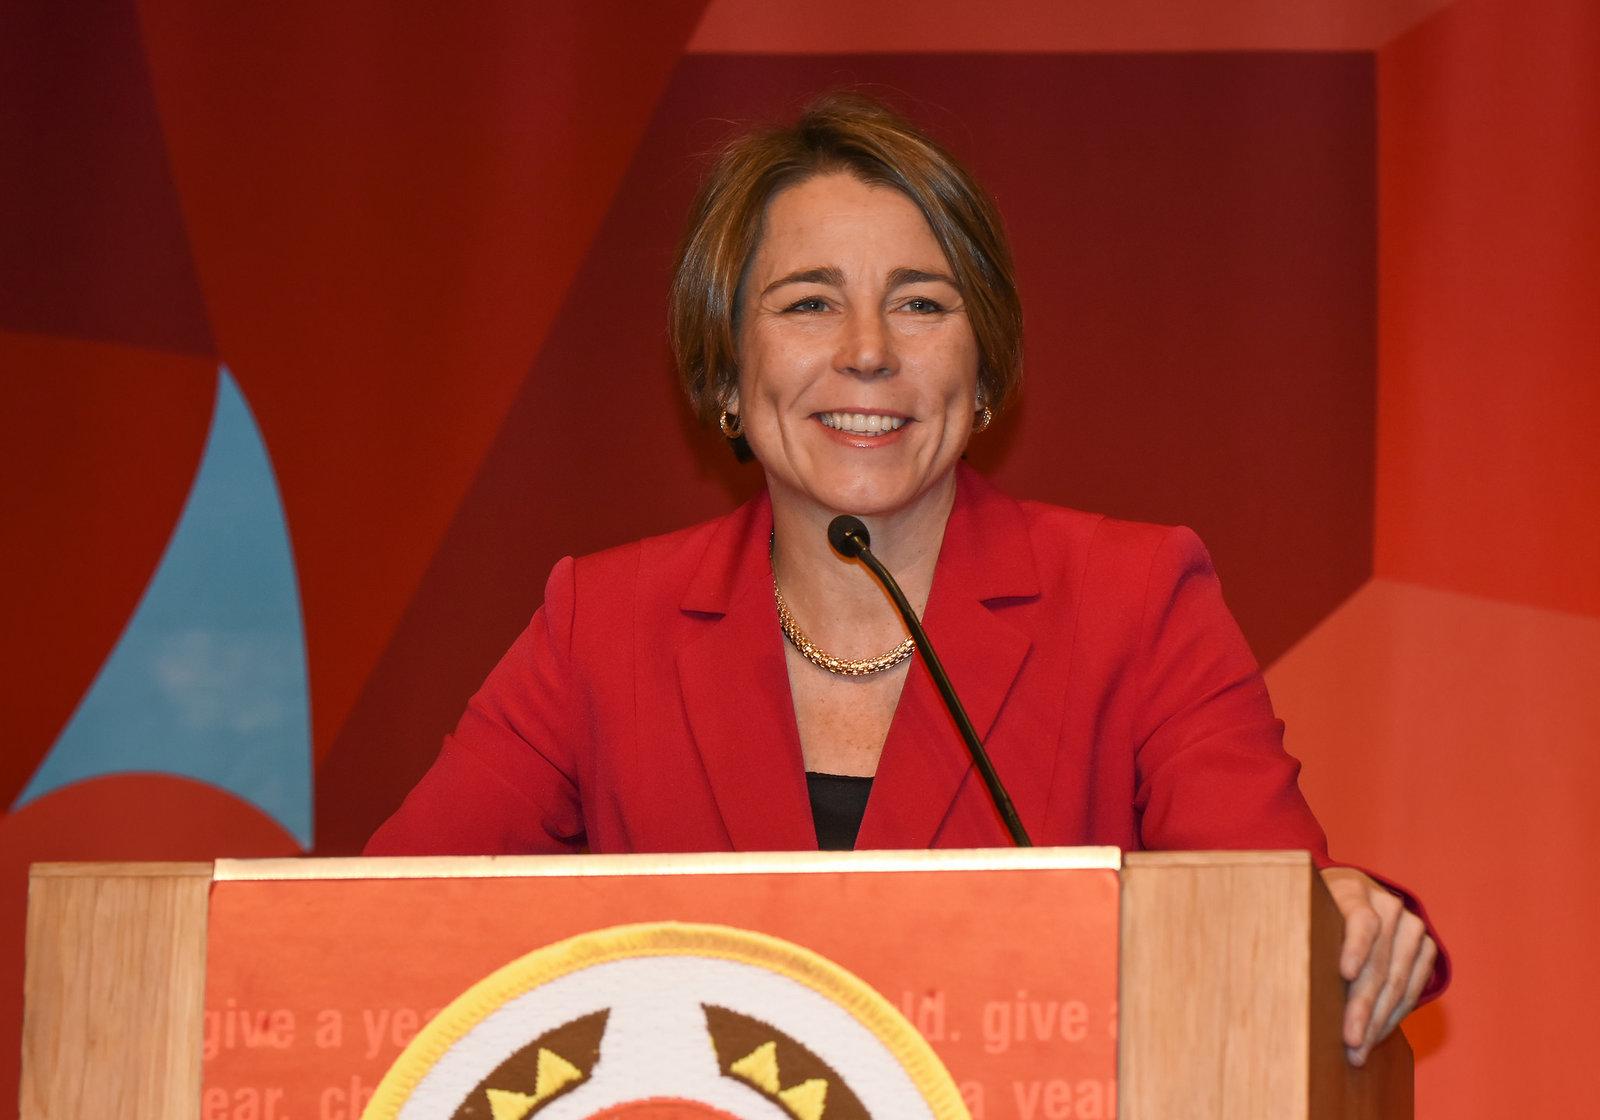 Massachusetts Attorney General Maura Healey has said she will defy Rep. Lamar Smith's subpoena